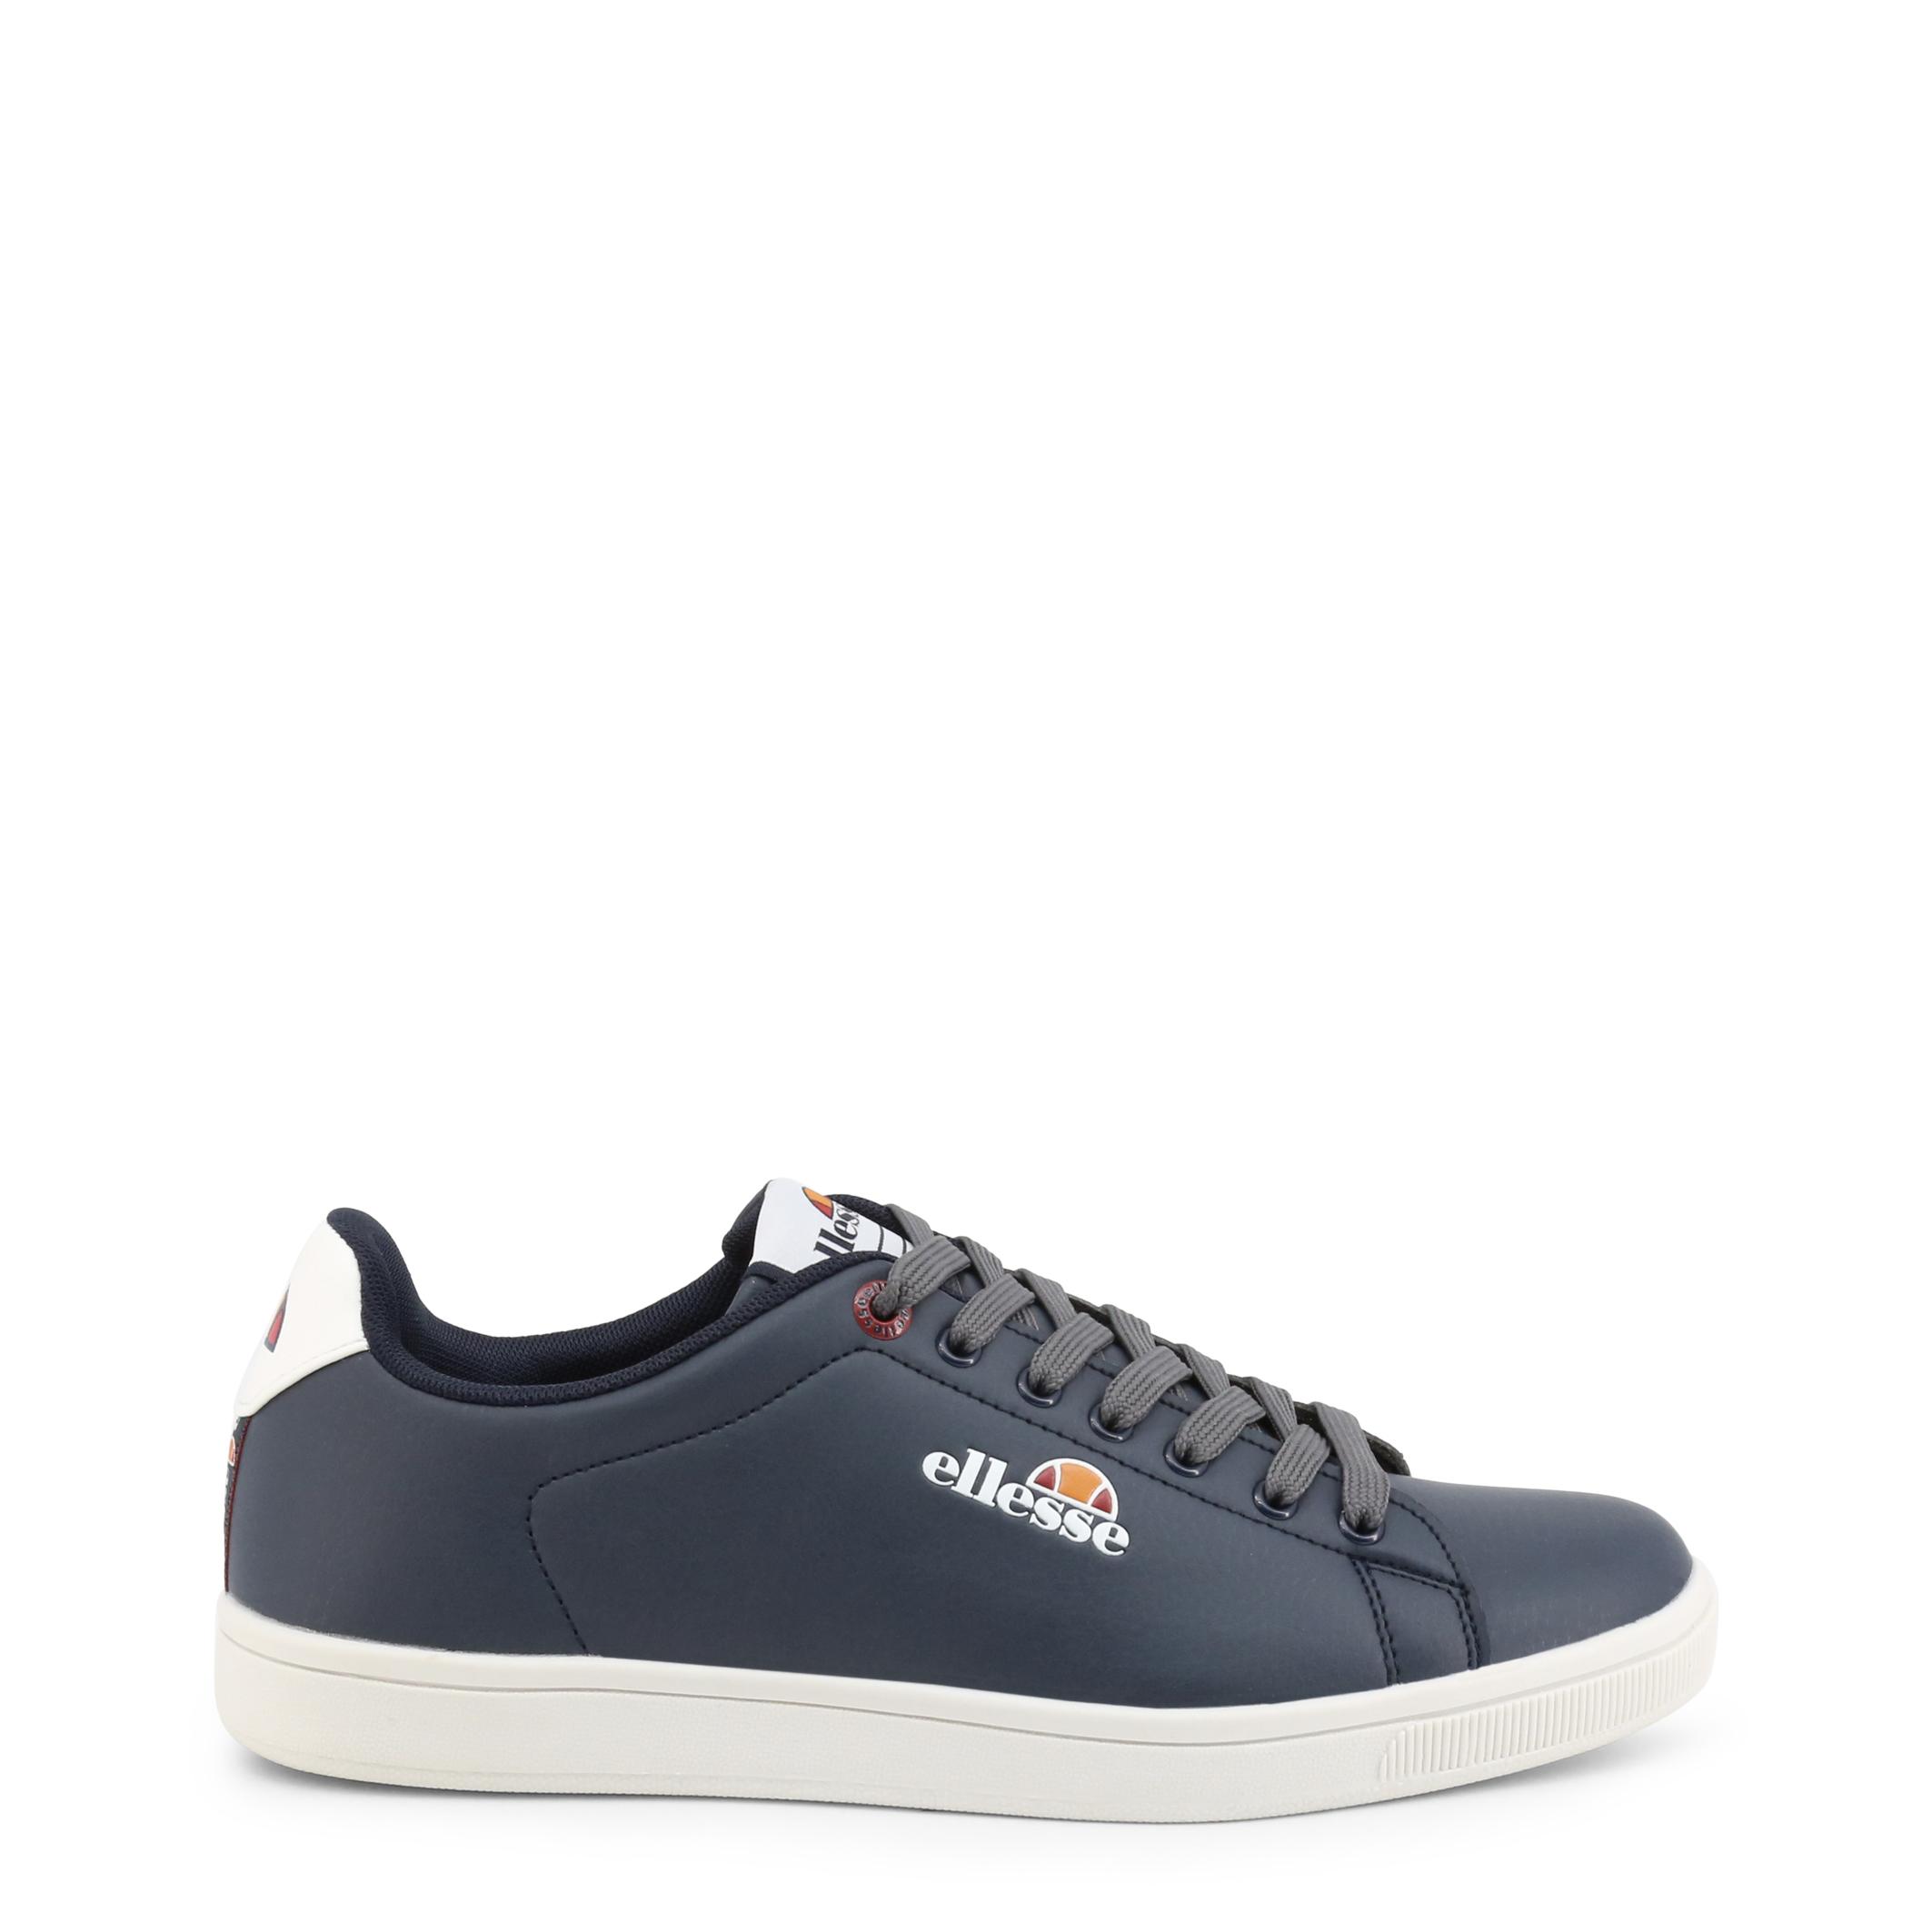 Baskets / Sport  Ellesse EL02M80405_02 grey